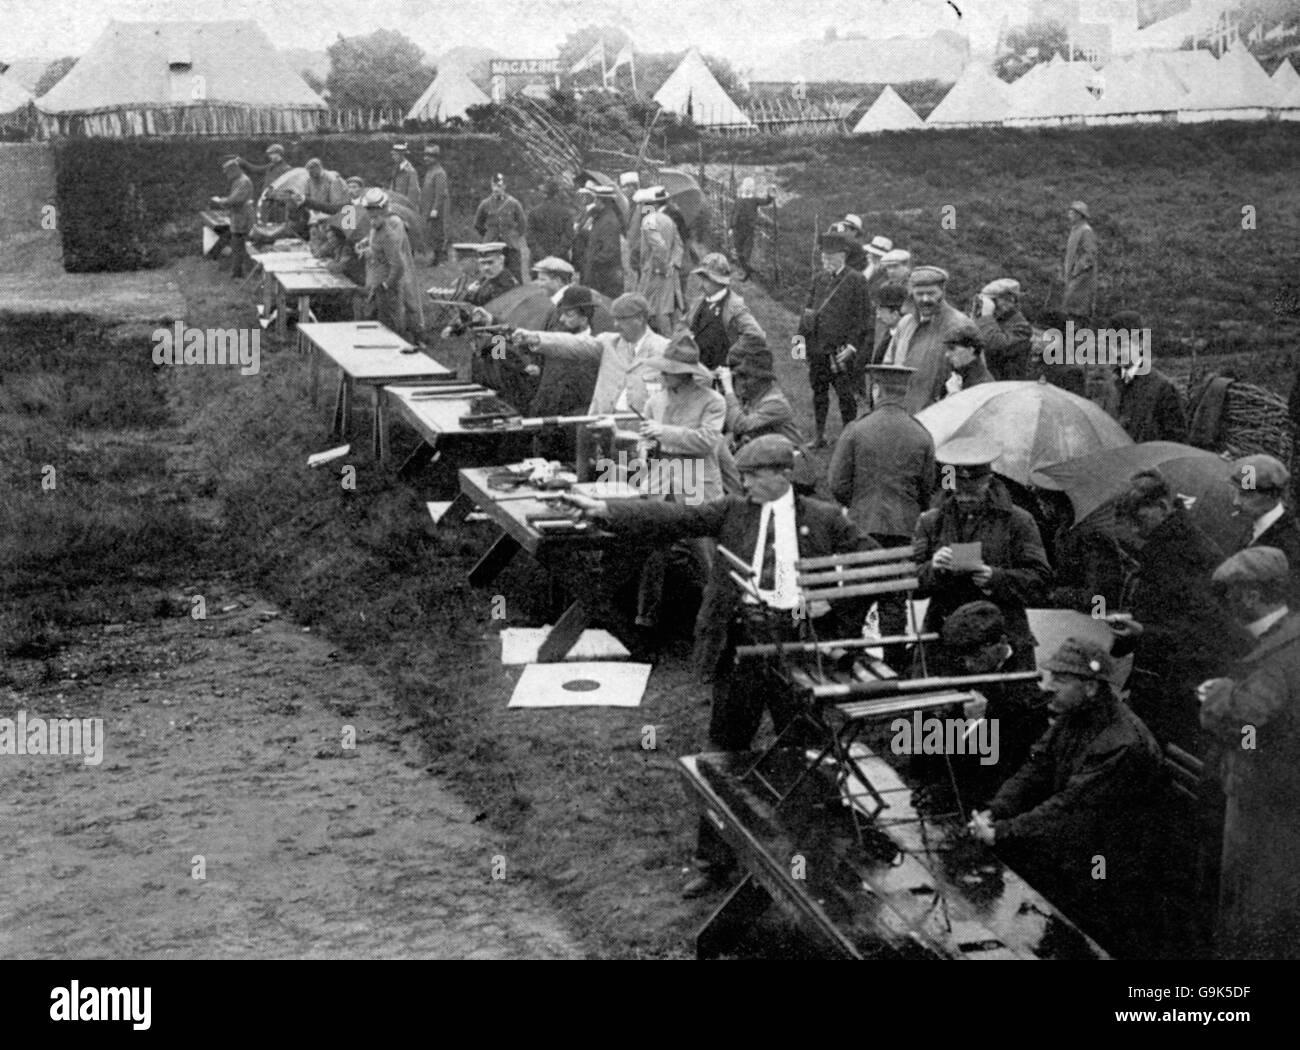 Shooting - London Olympic Games 1908 - Rapid-Fire Pistol - Bisley - Stock Image